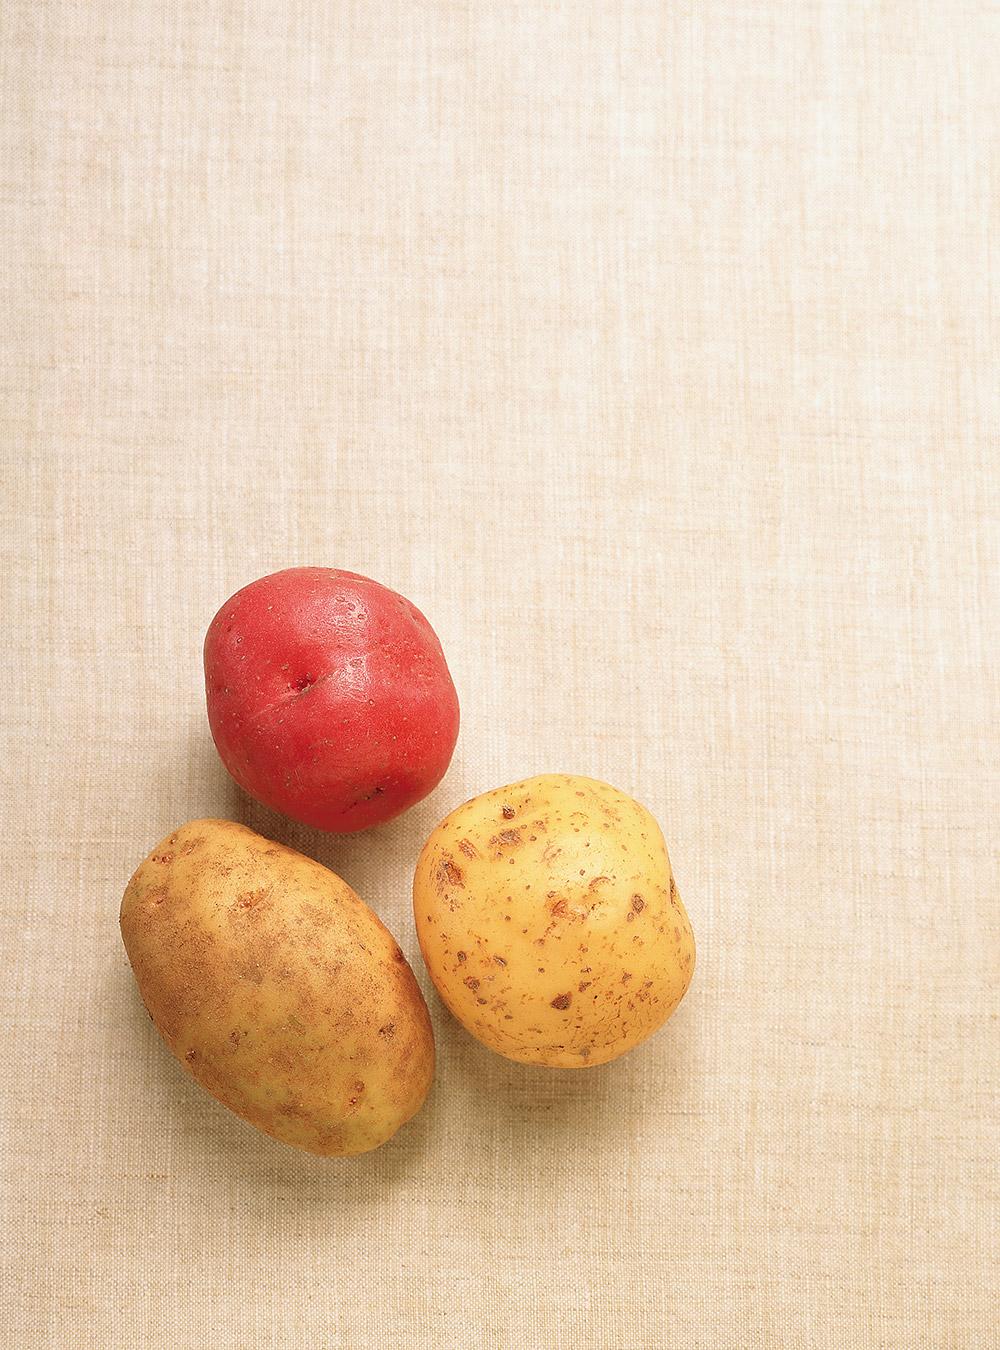 Pommes de terre farcies toutes garnies | ricardo